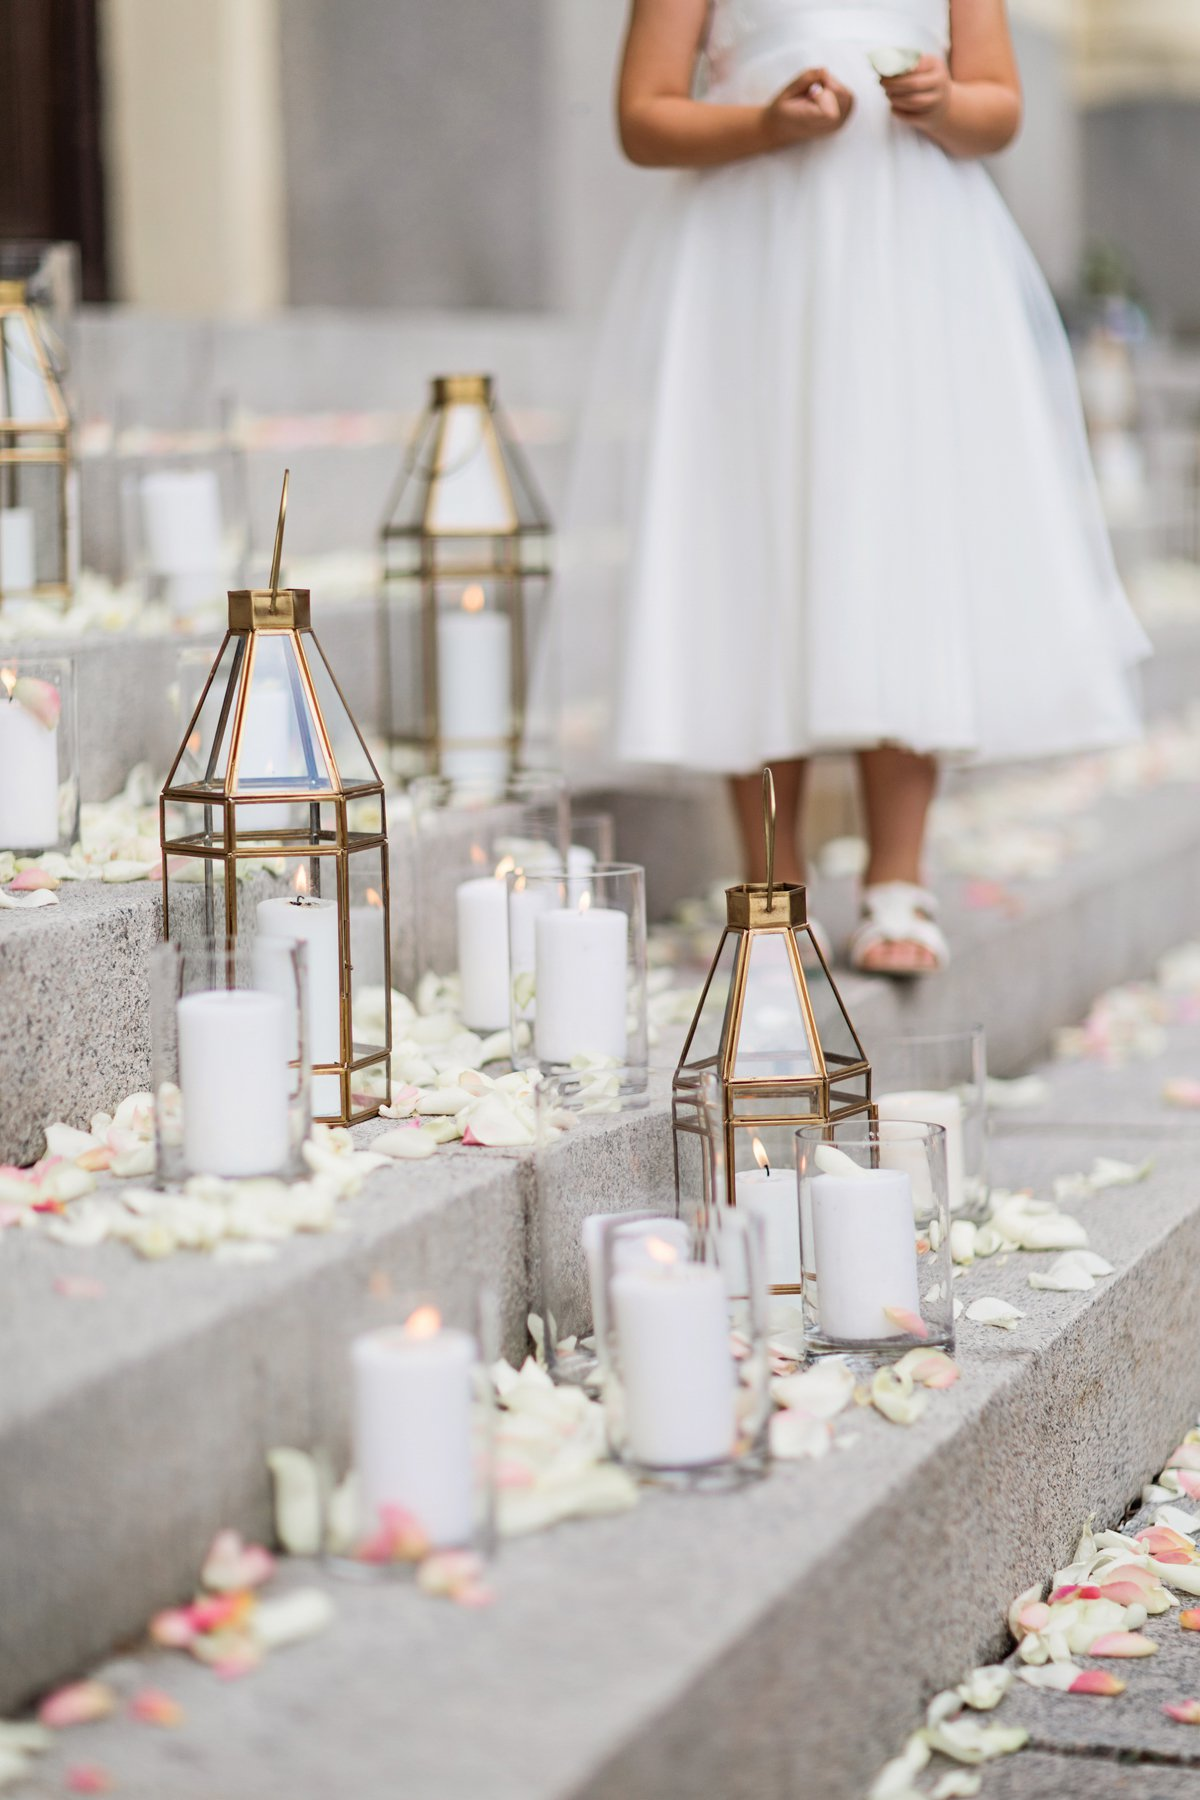 KenzaZouiten_weddingdetails_st-4-1